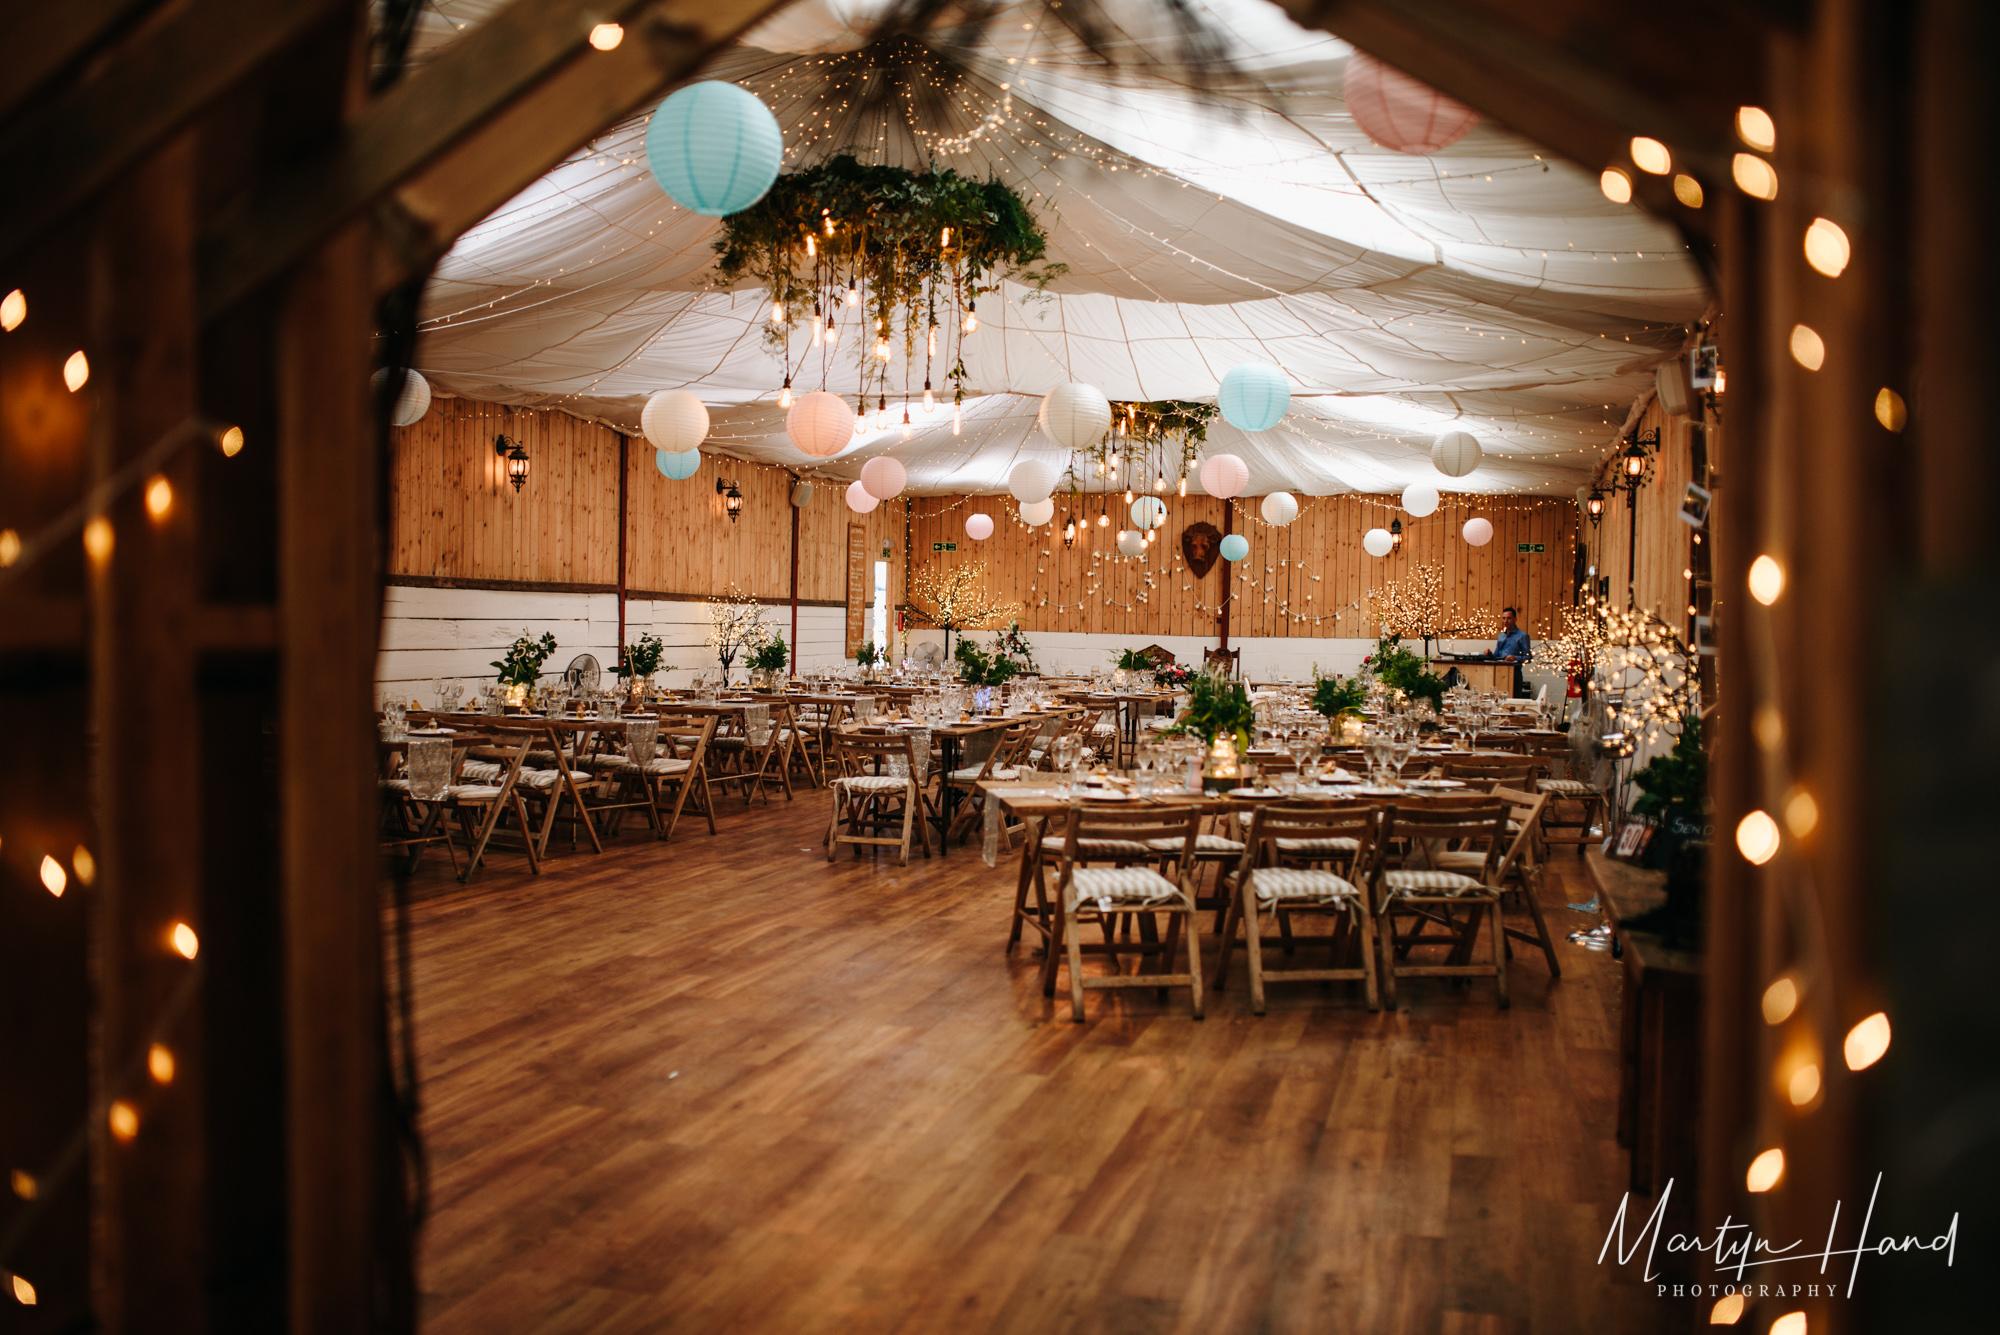 Wellbeing Farm Wedding Photographer Martyn Hand Photography